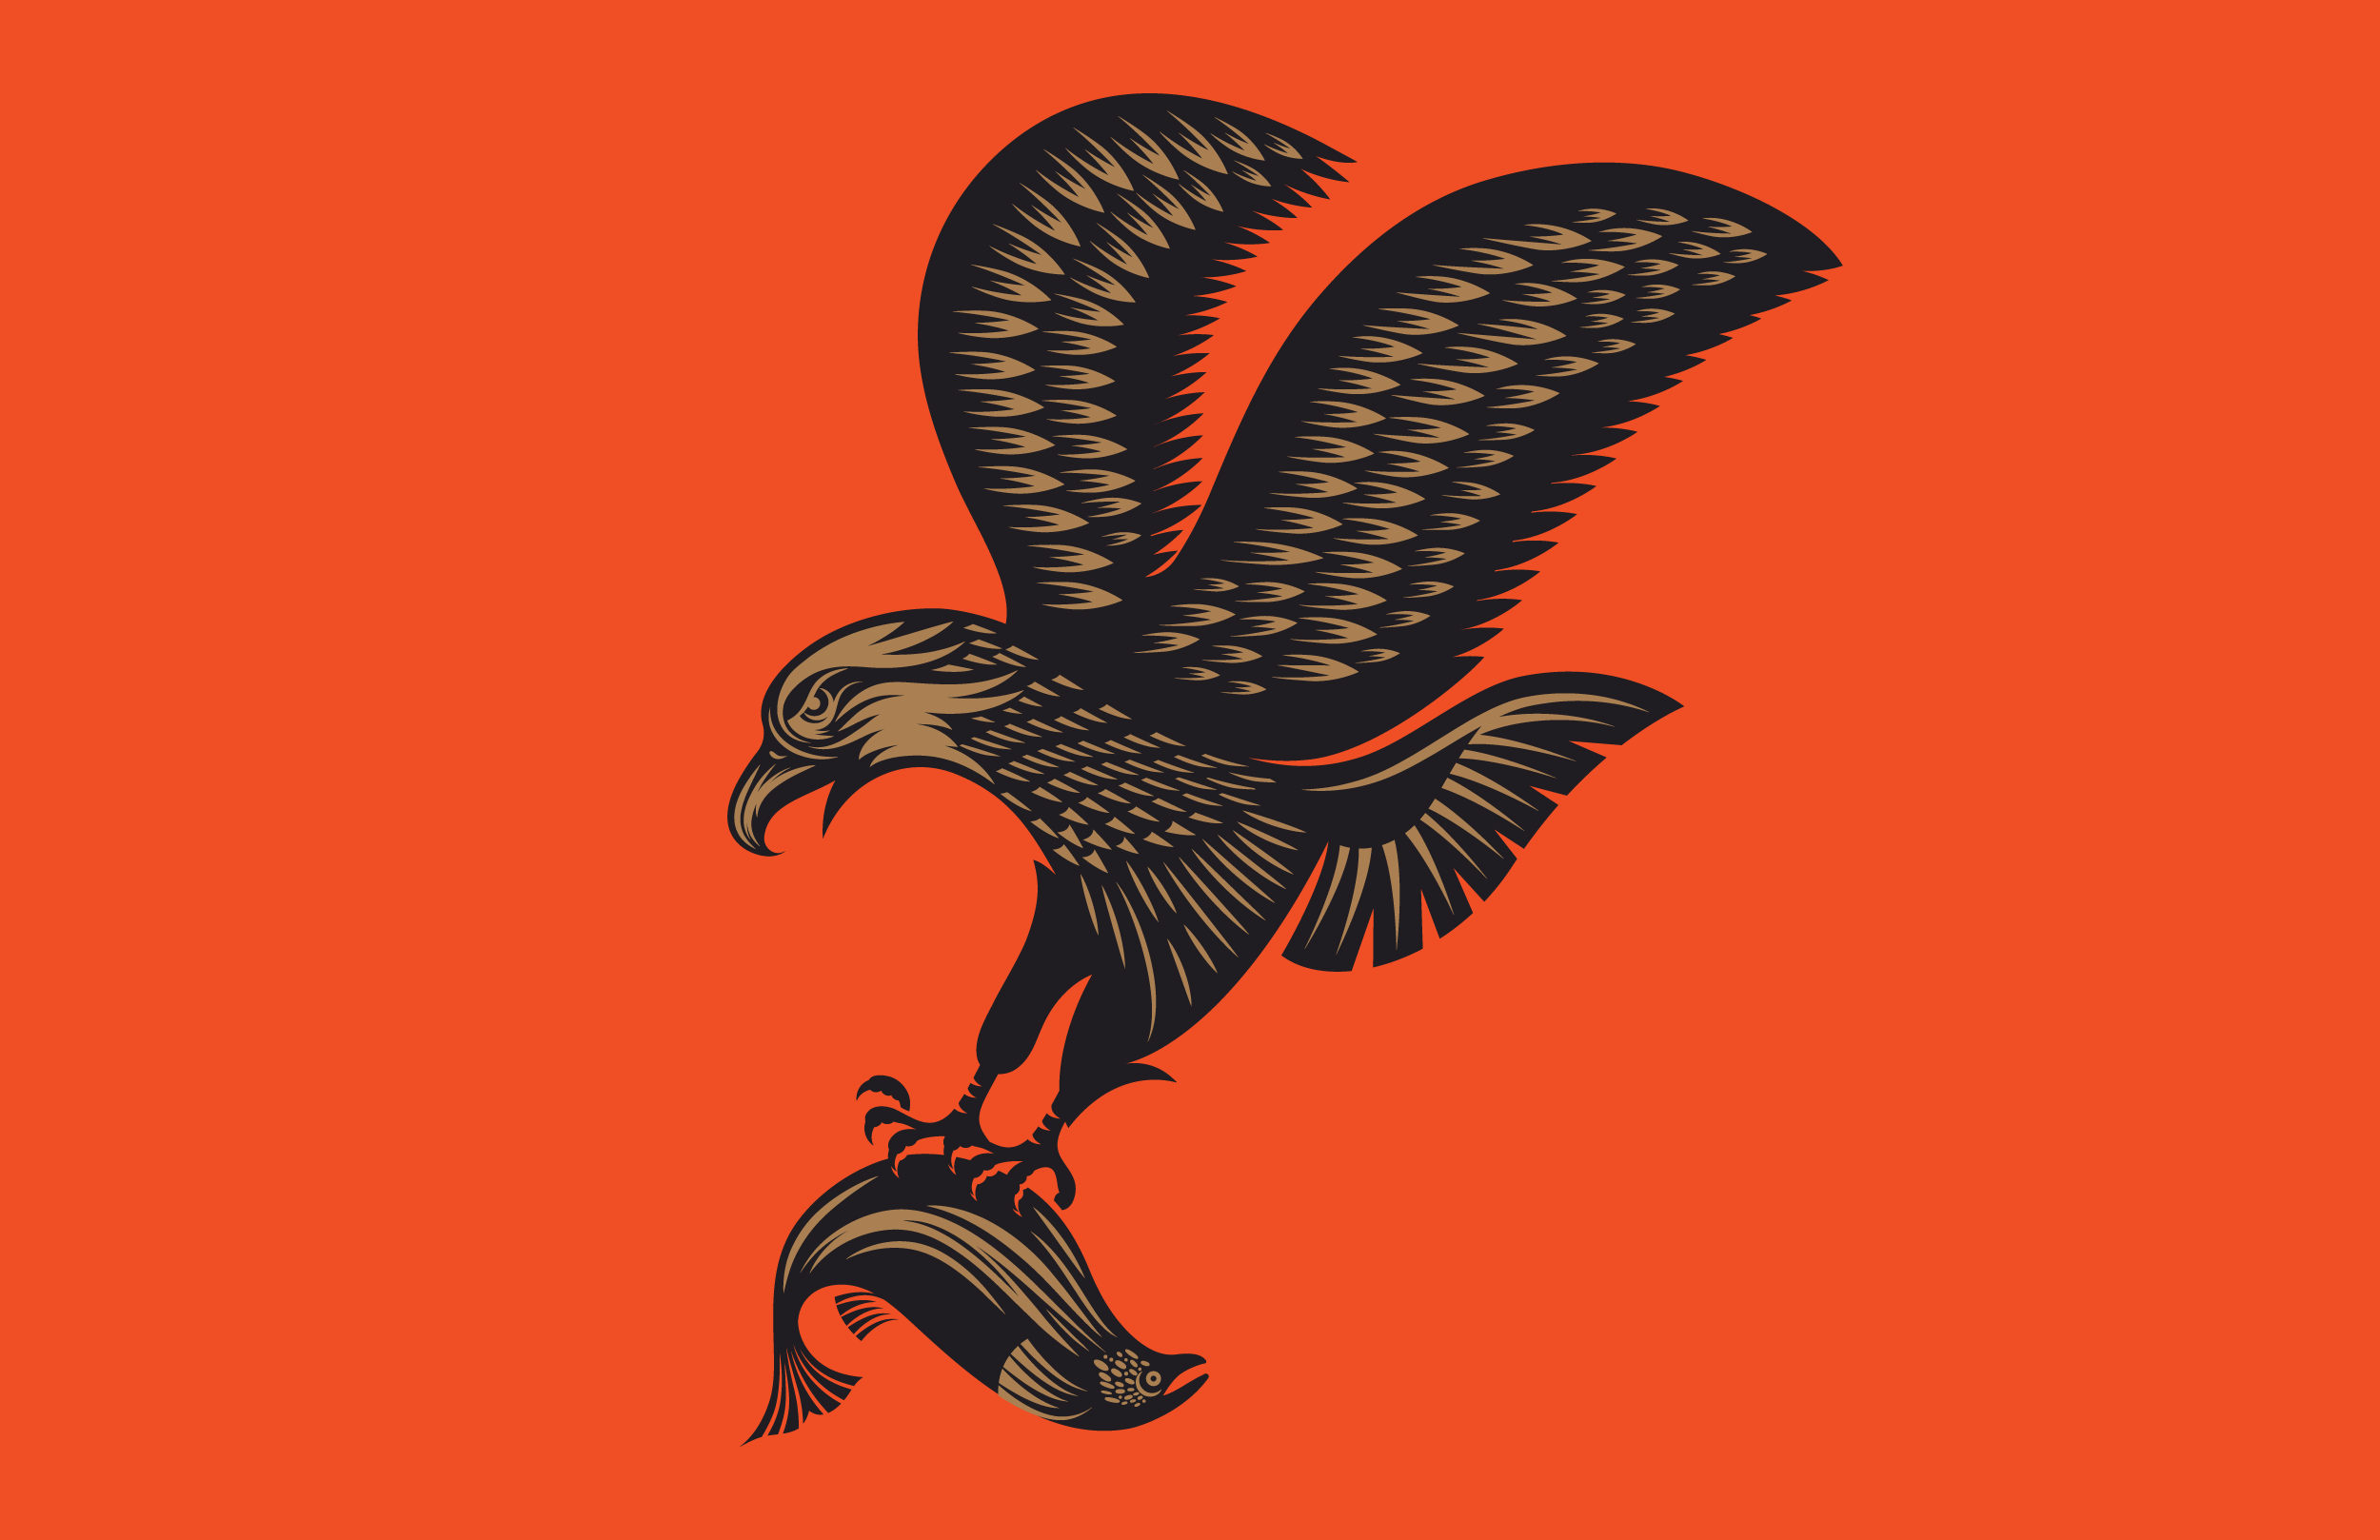 AKHG_APPAREL_Bird_03.png